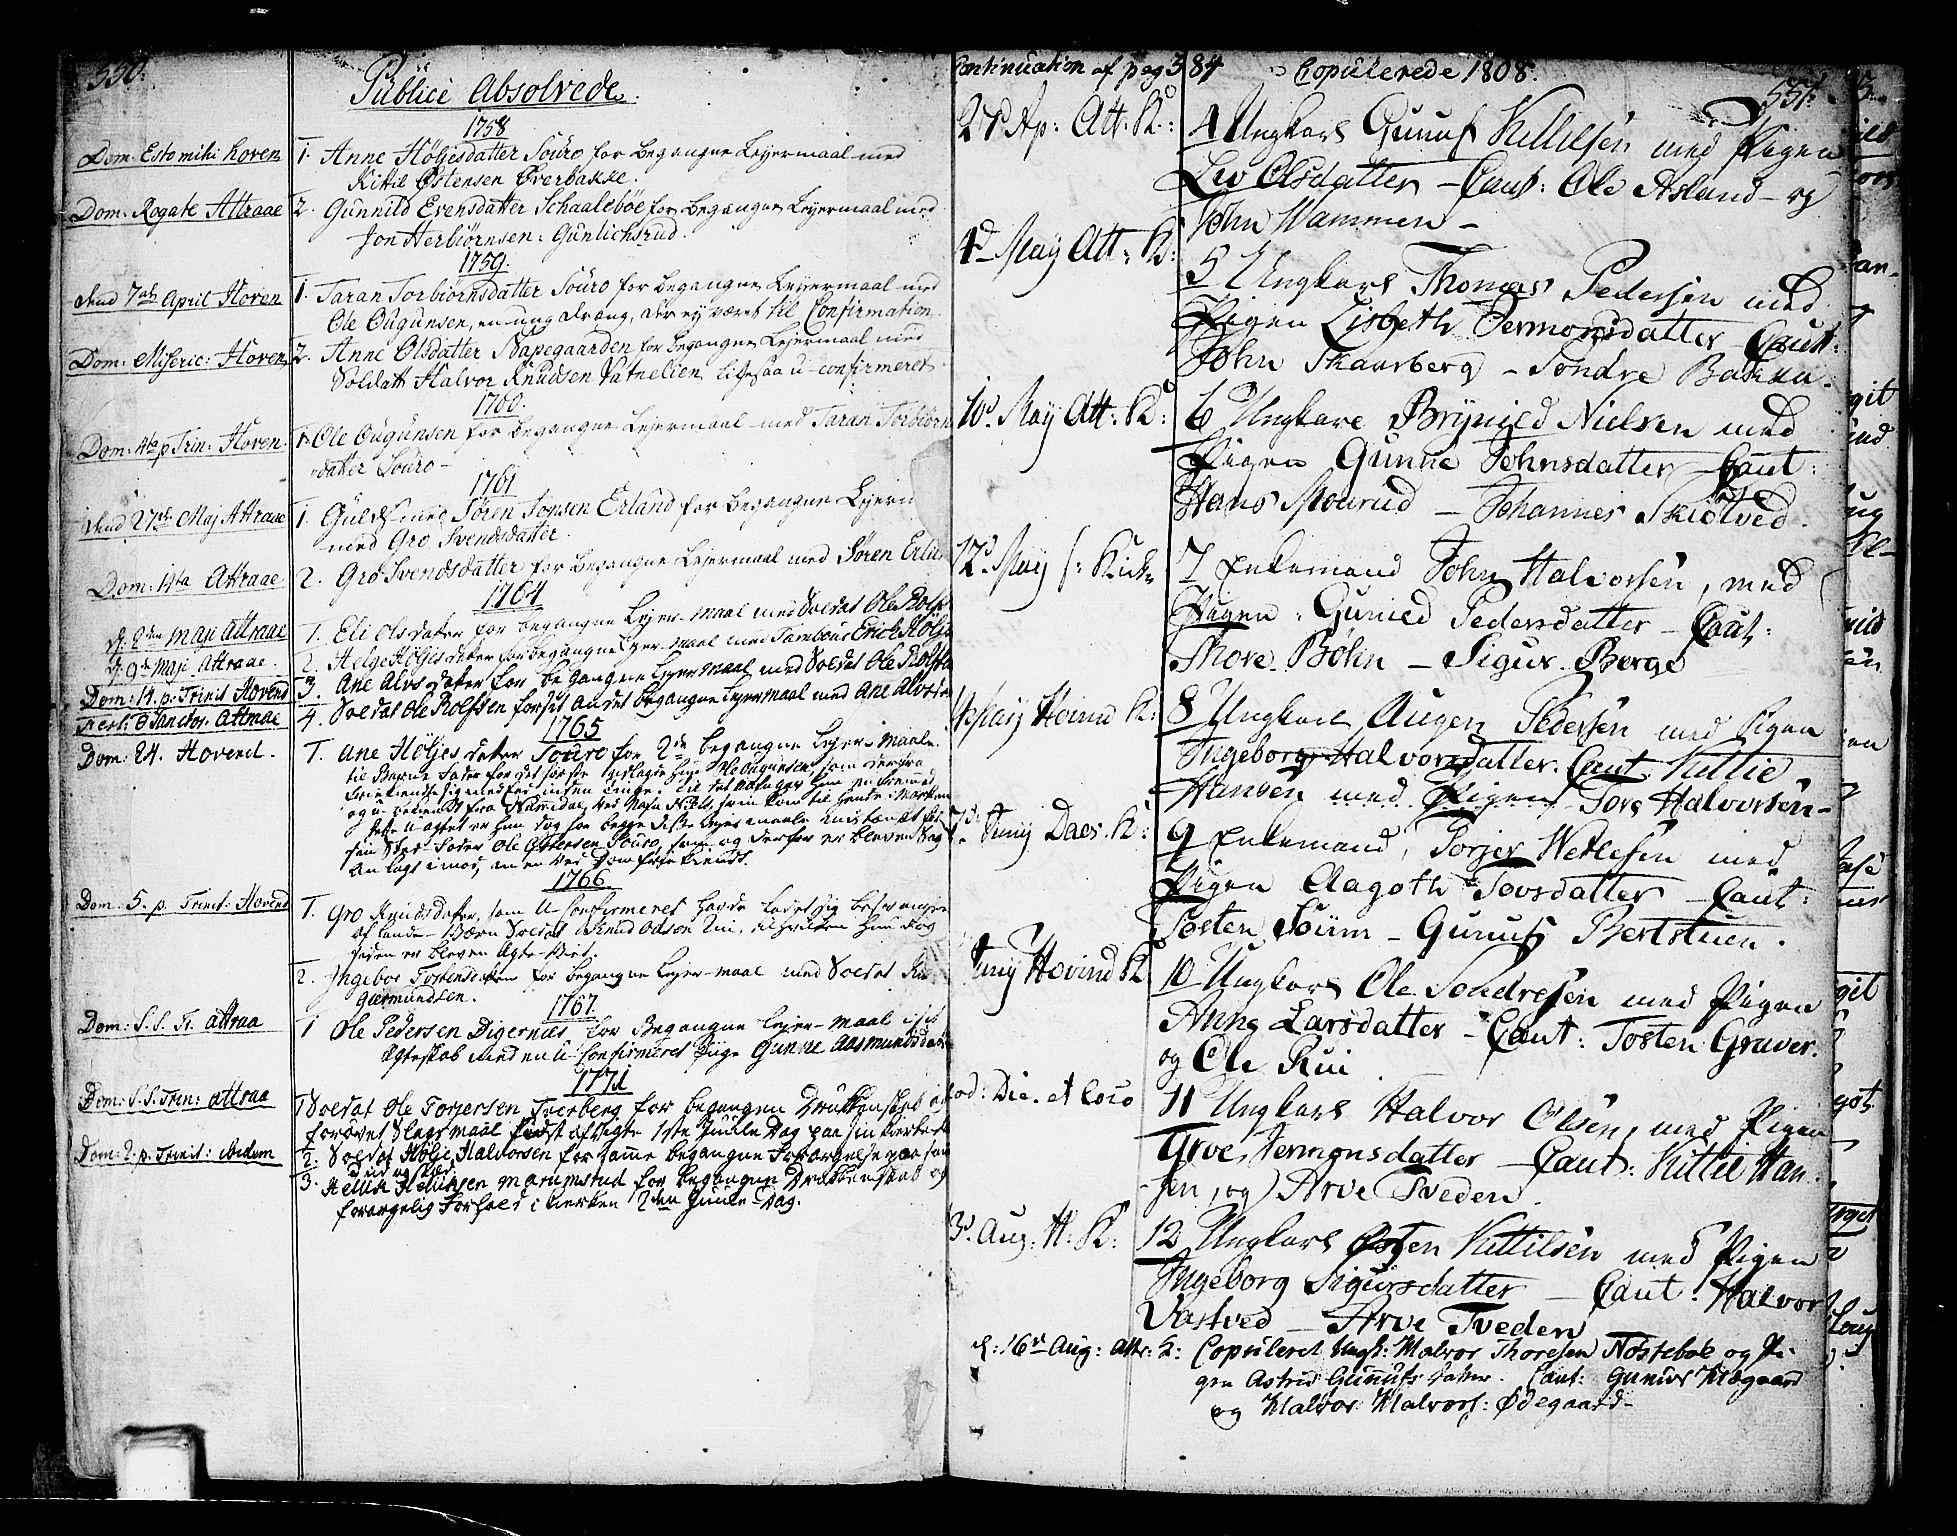 SAKO, Tinn kirkebøker, F/Fa/L0002: Ministerialbok nr. I 2, 1757-1810, s. 550-551